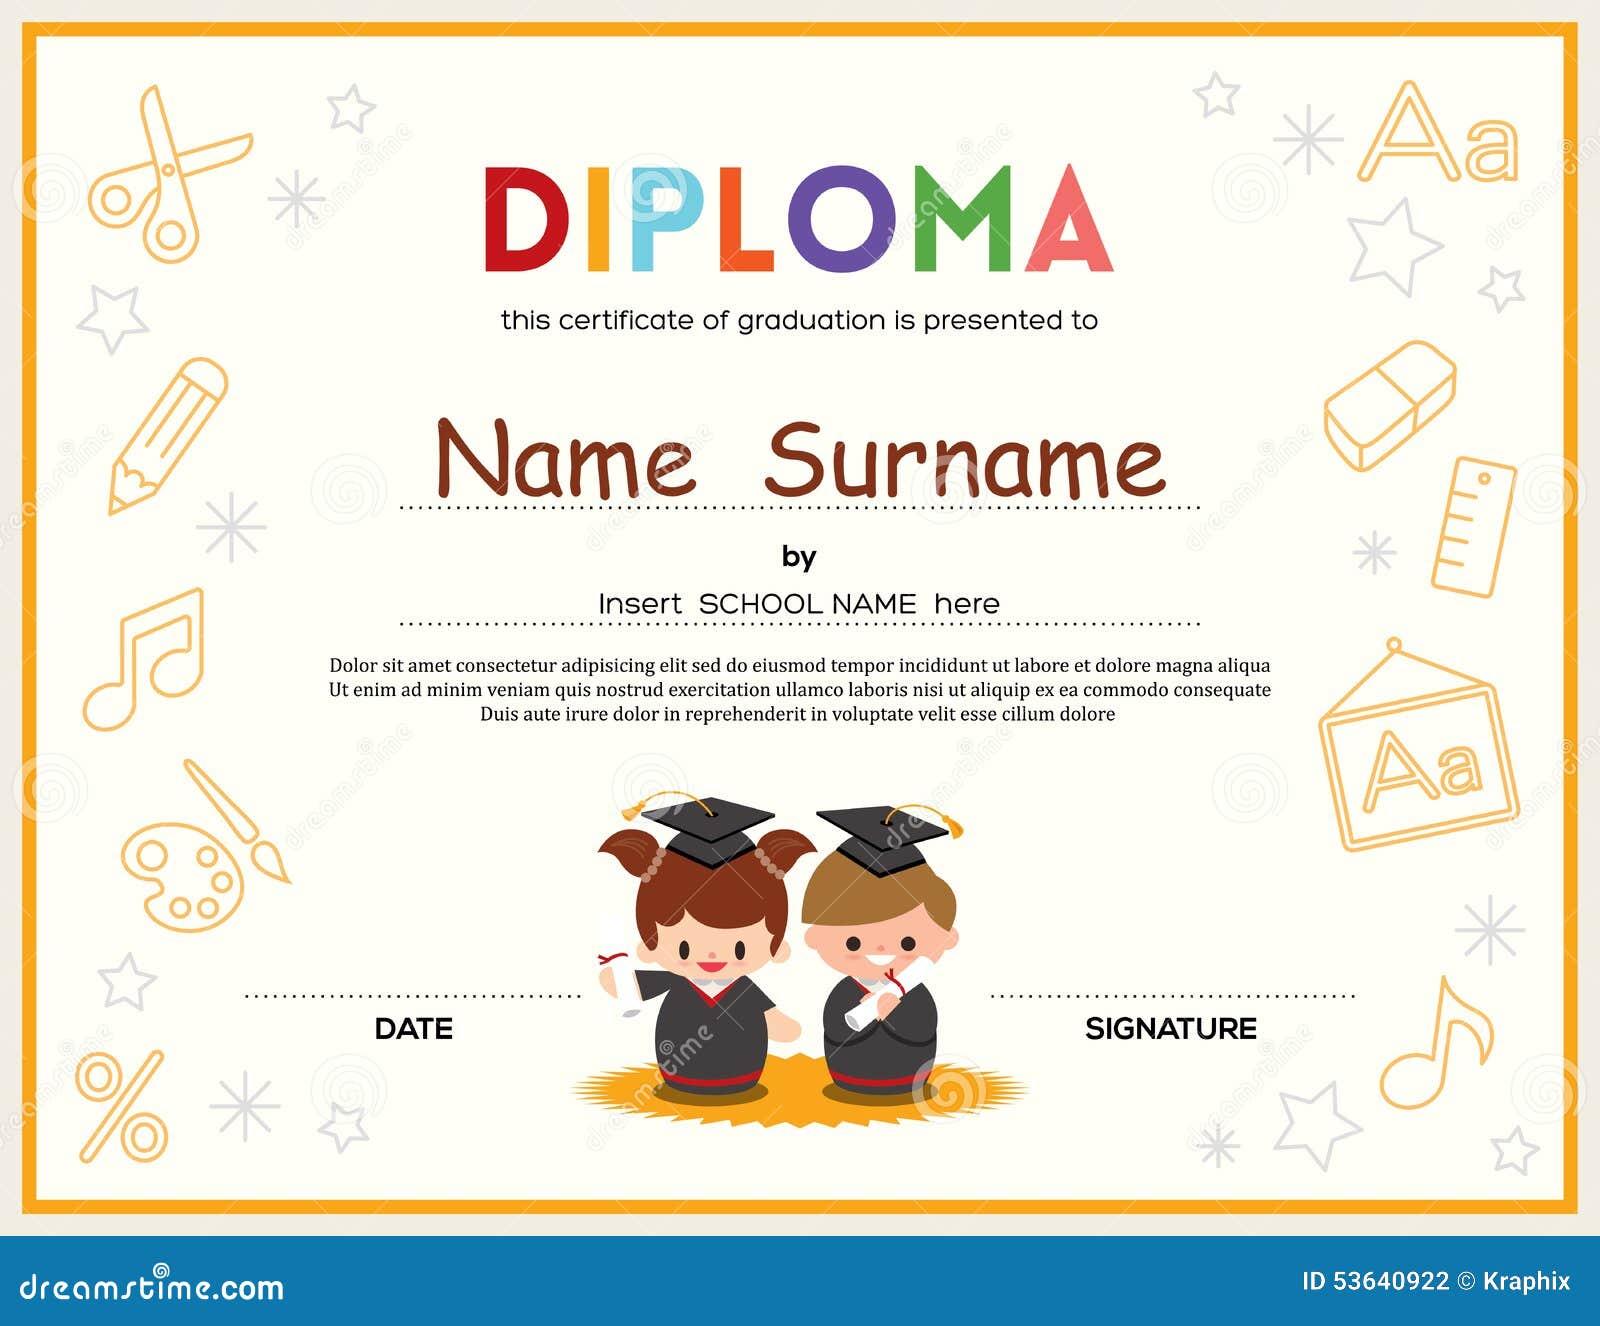 Preschool kids diploma certificate design template stock vector preschool kids diploma certificate design template royalty free vector 1betcityfo Choice Image